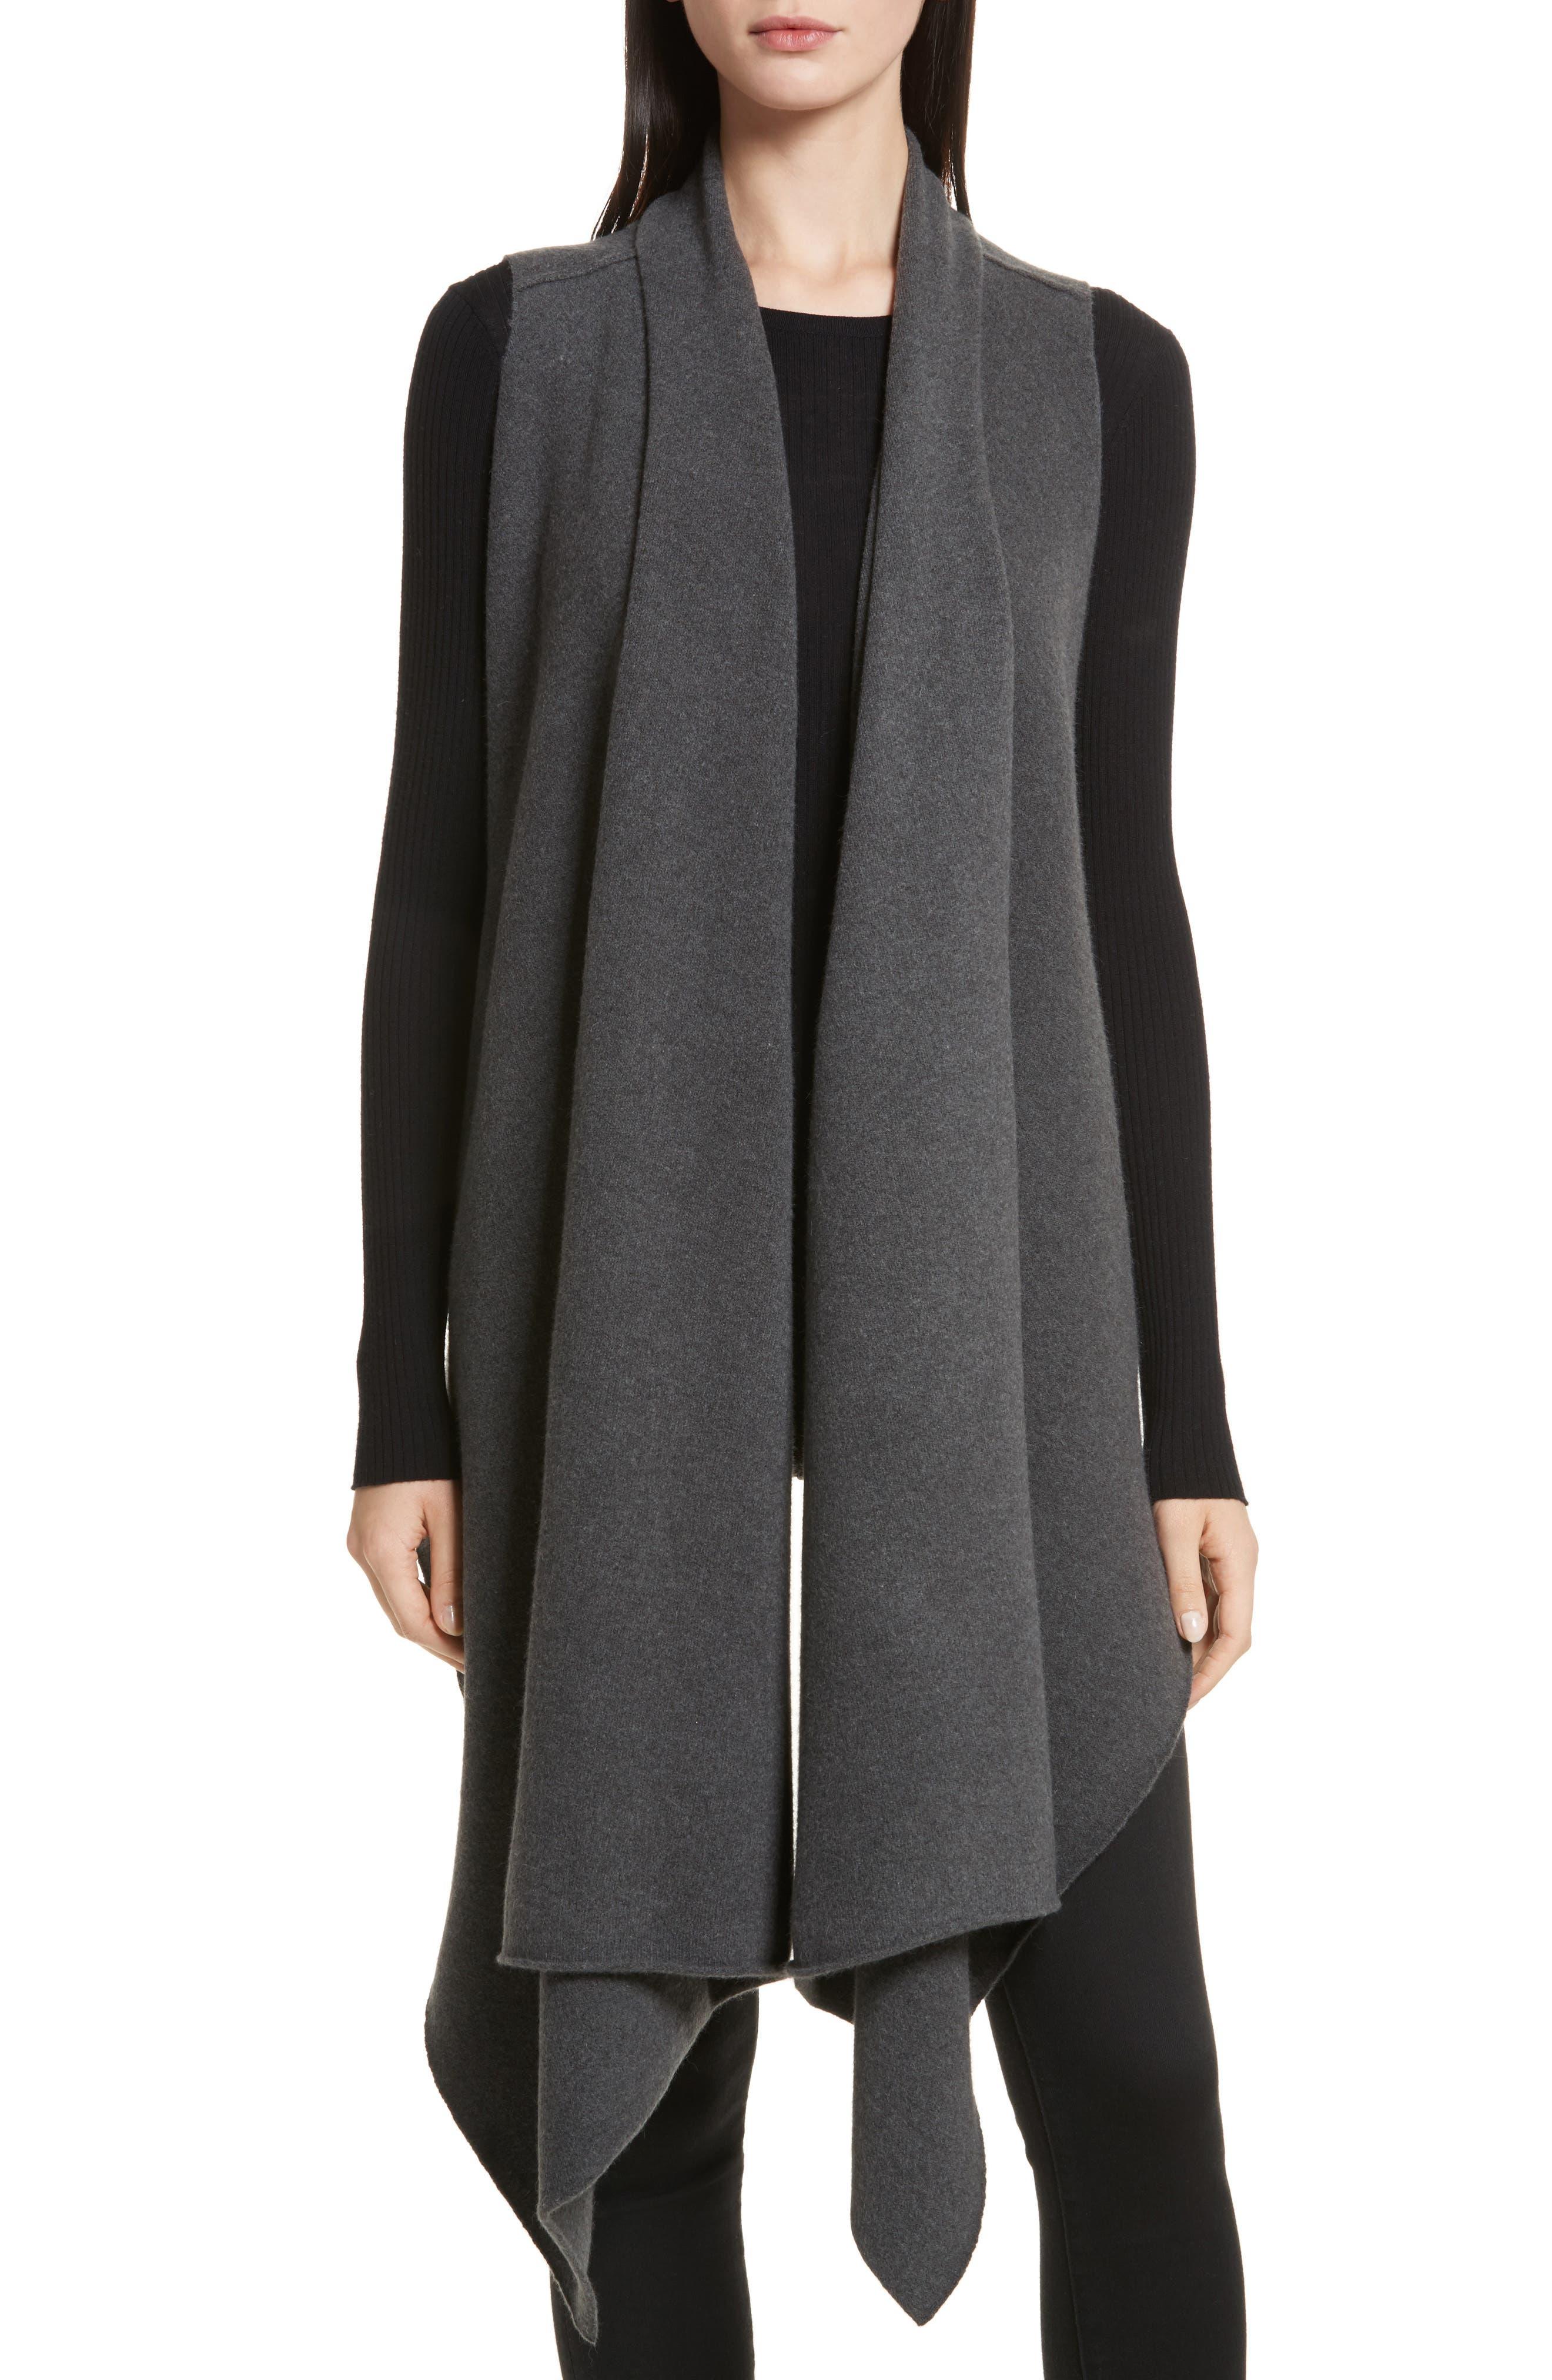 Sorin Merino Wool Blend Wrap Vest,                             Main thumbnail 1, color,                             Shale Melange